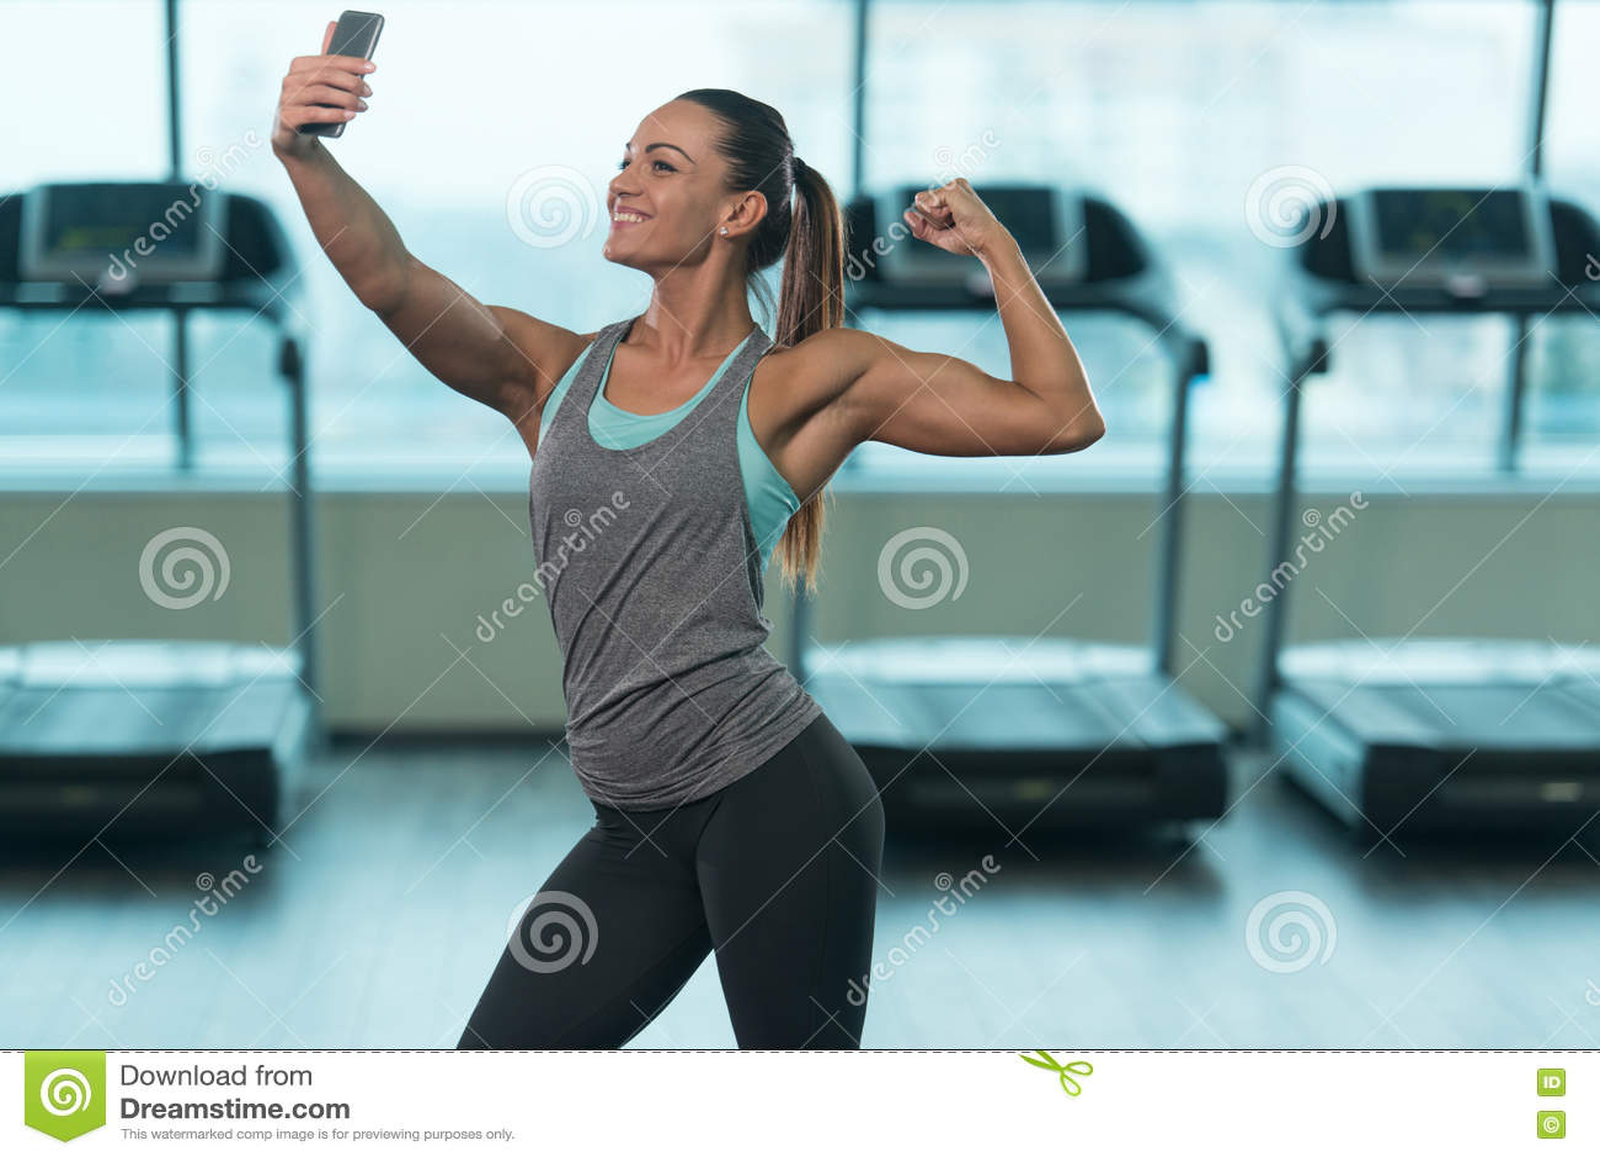 Selfie Fitness Selfie Girls nudes (21 photos), Tits, Sideboobs, Twitter, cameltoe 2006